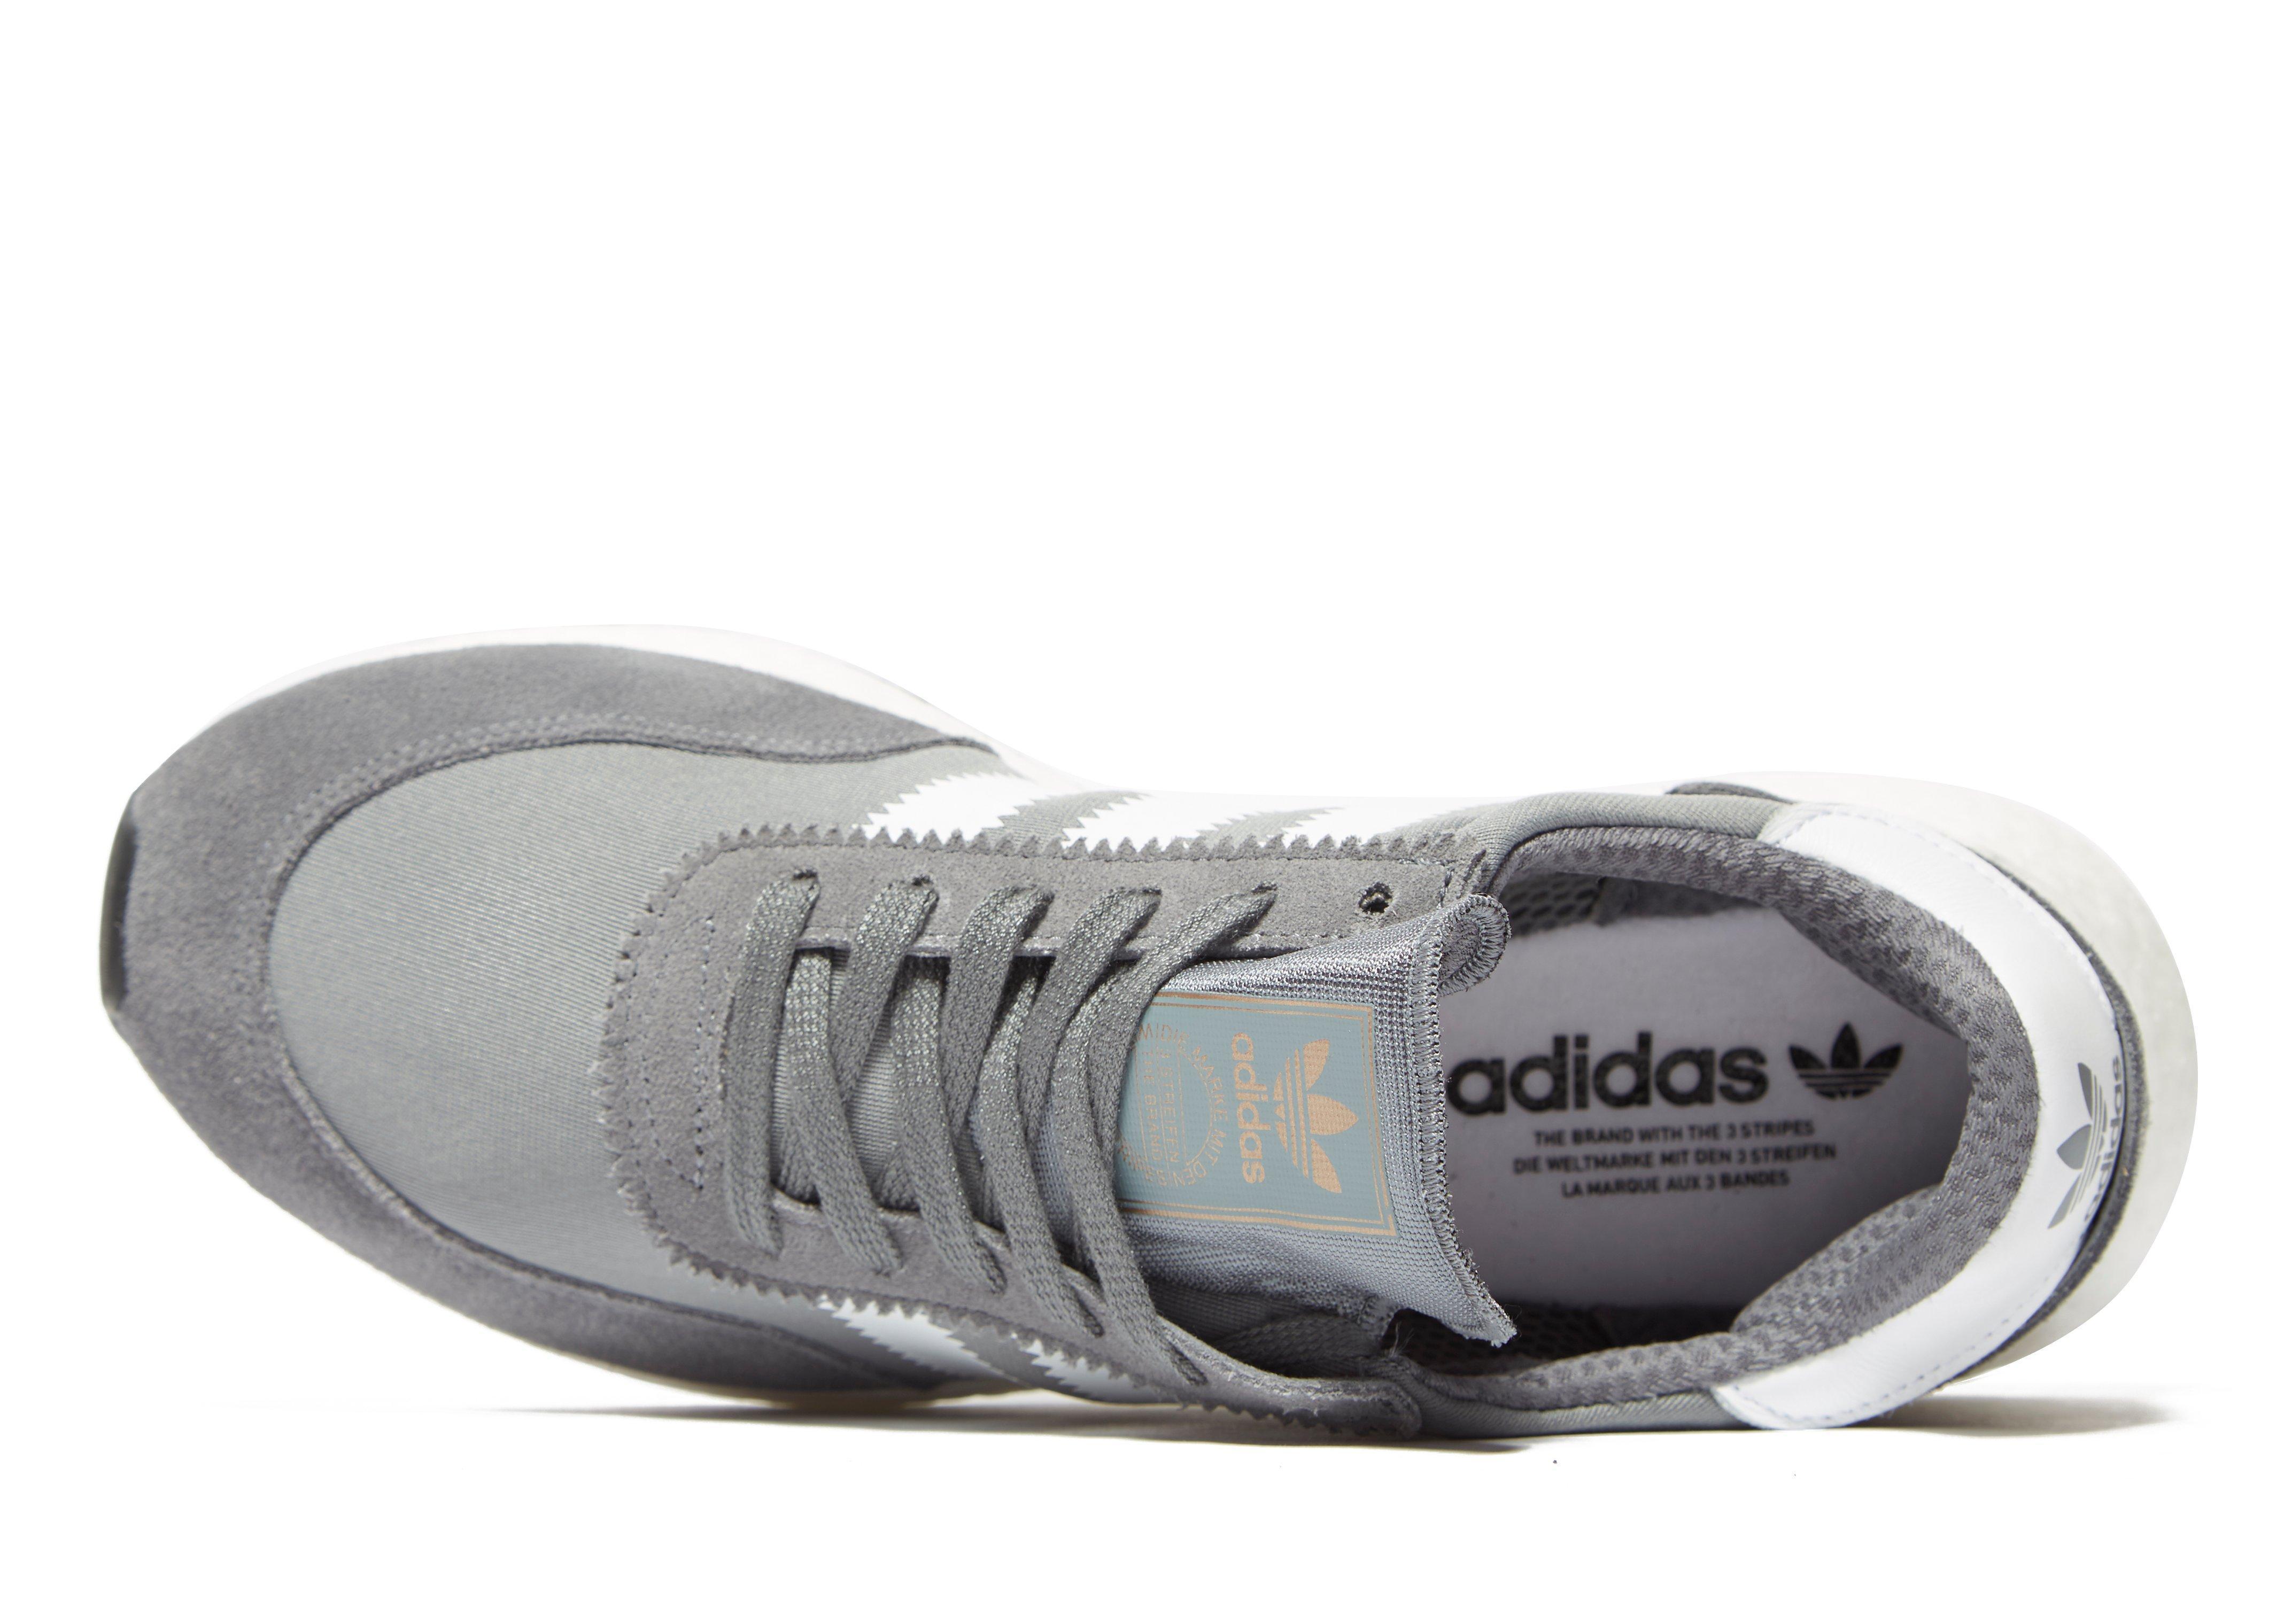 Adidas Originals i 5923 impulso en gris para hombres Lyst